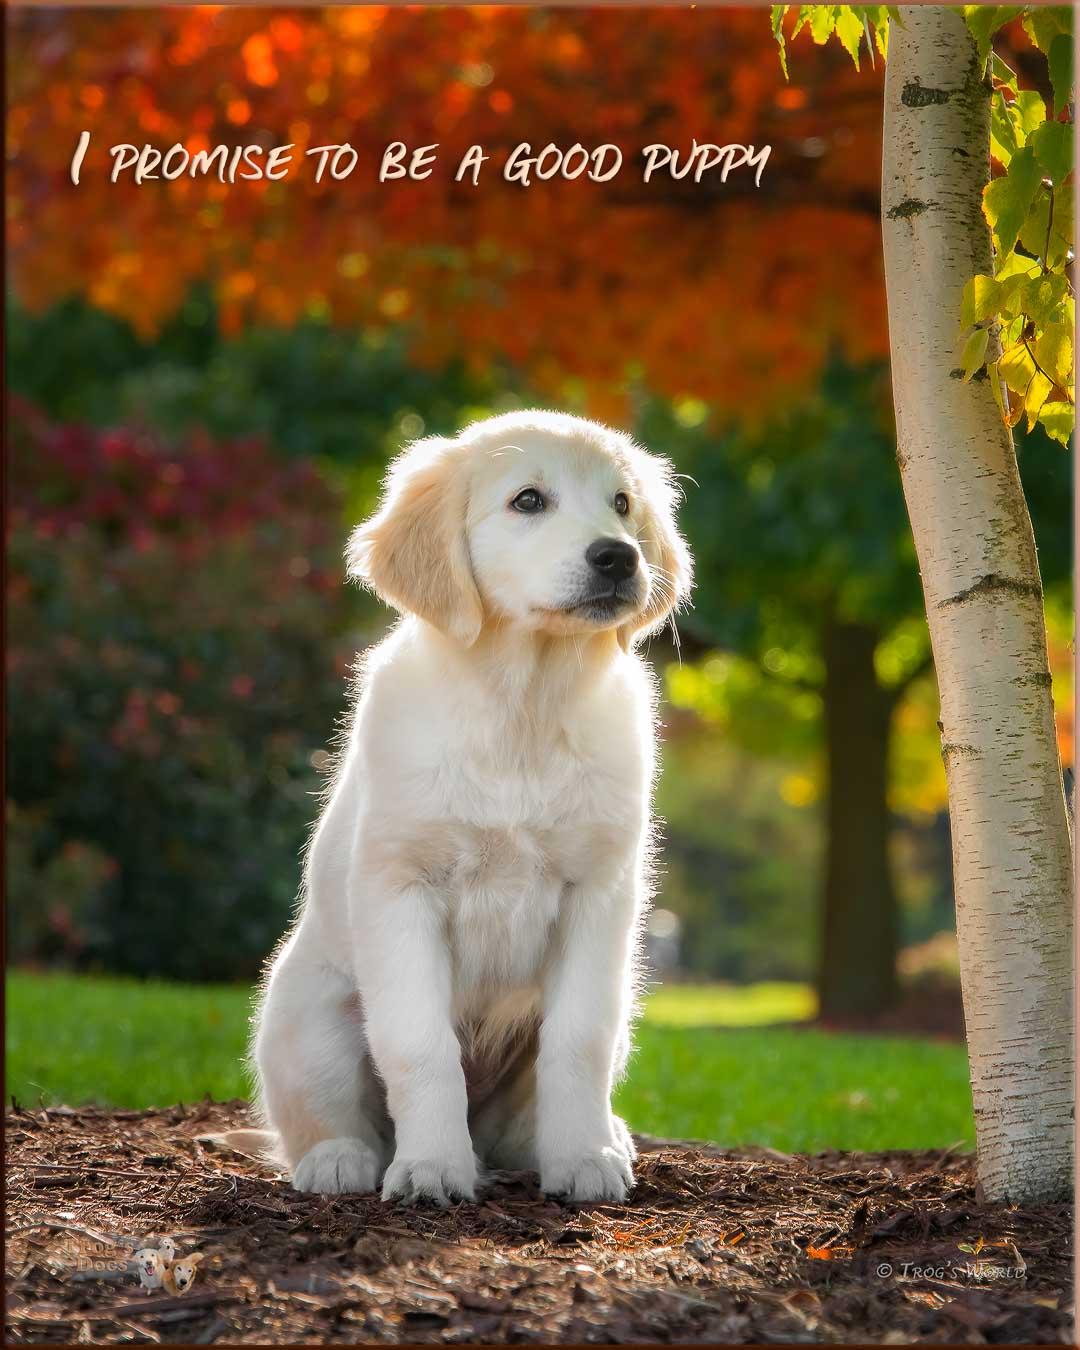 Golden Retriever puppy in the autumn colors